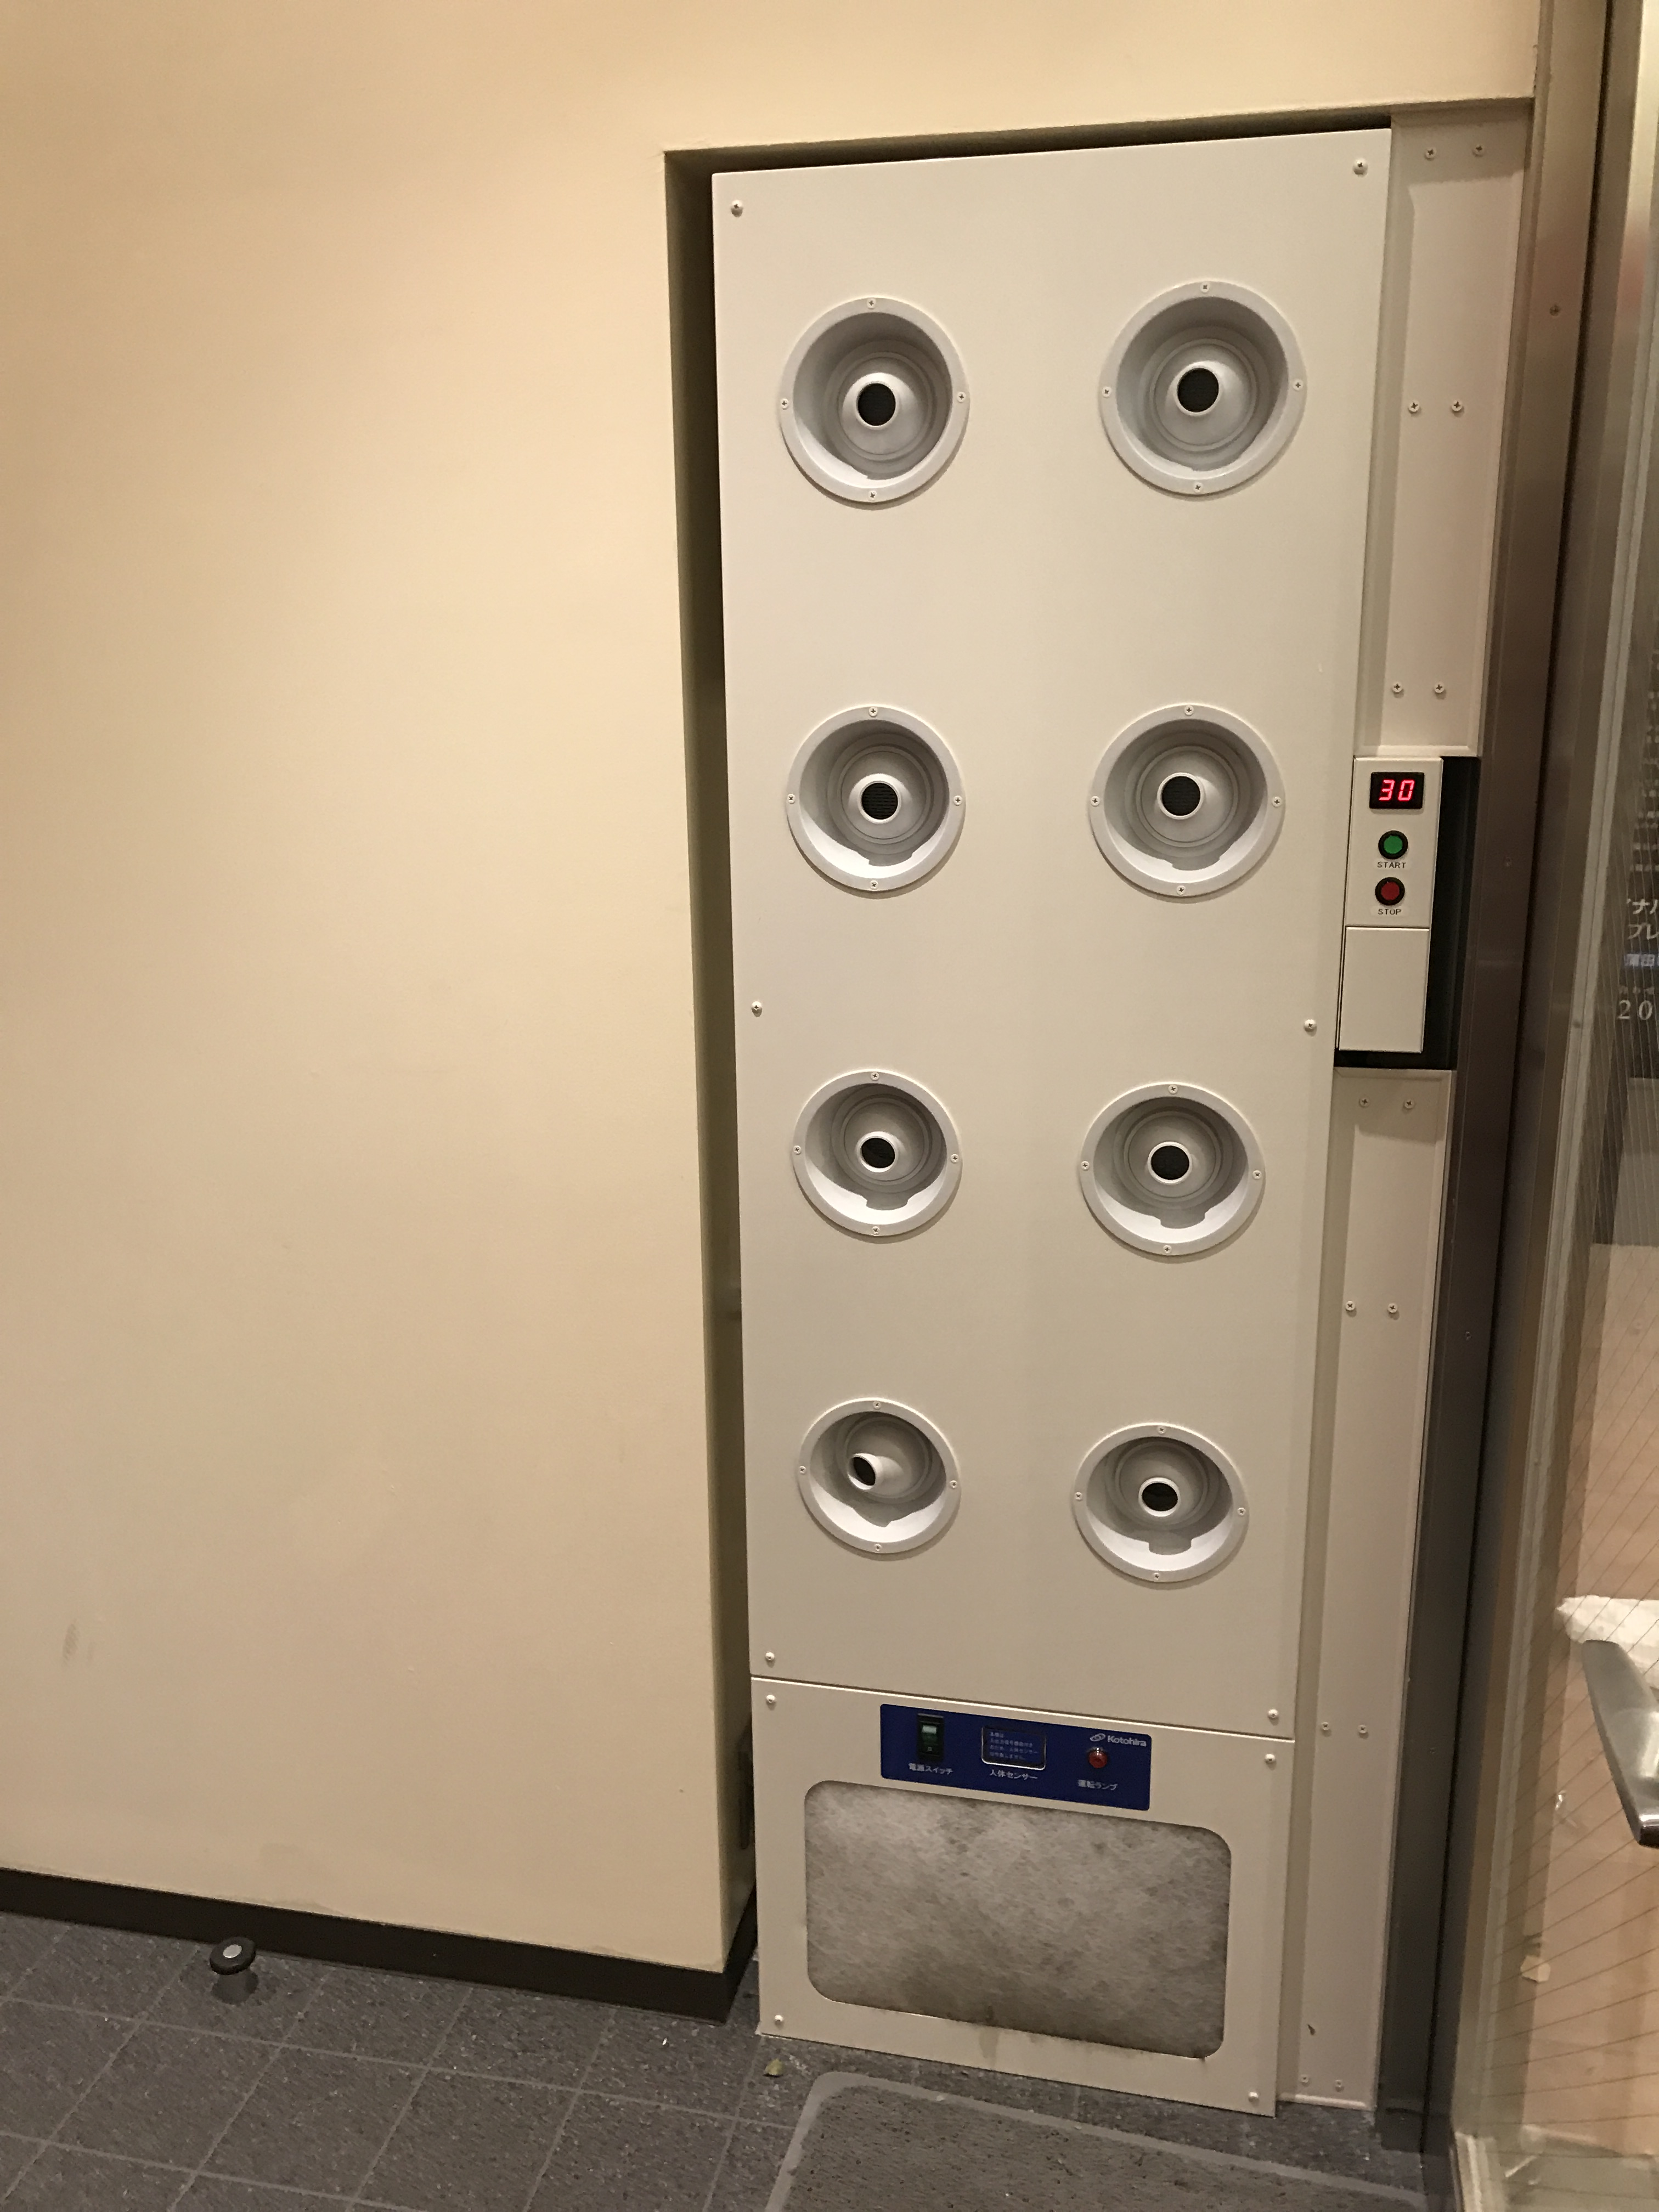 INABA96 蒲田5丁目店 エアシャワーでホコリ除去